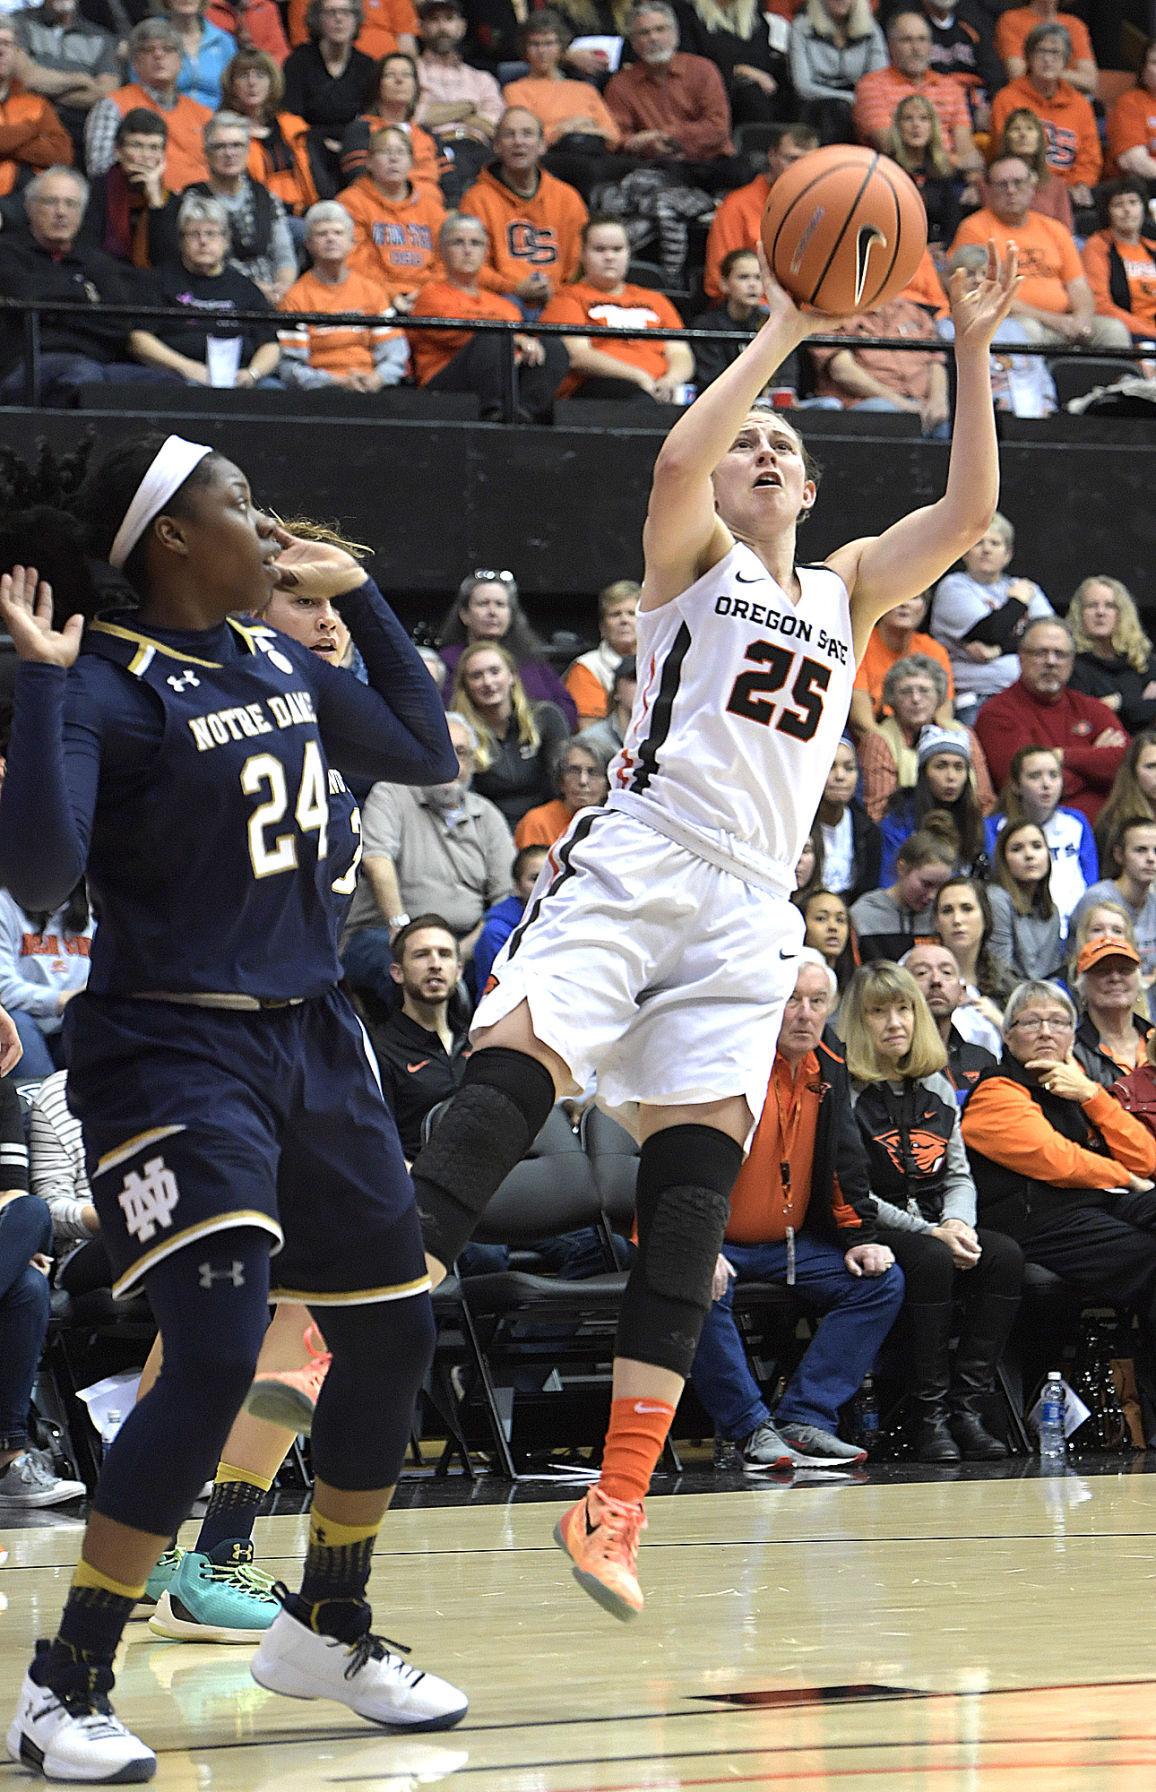 OSU women's basketball: Beavers ready for grind of the Pac-12 | Basketball | gazettetimes.com